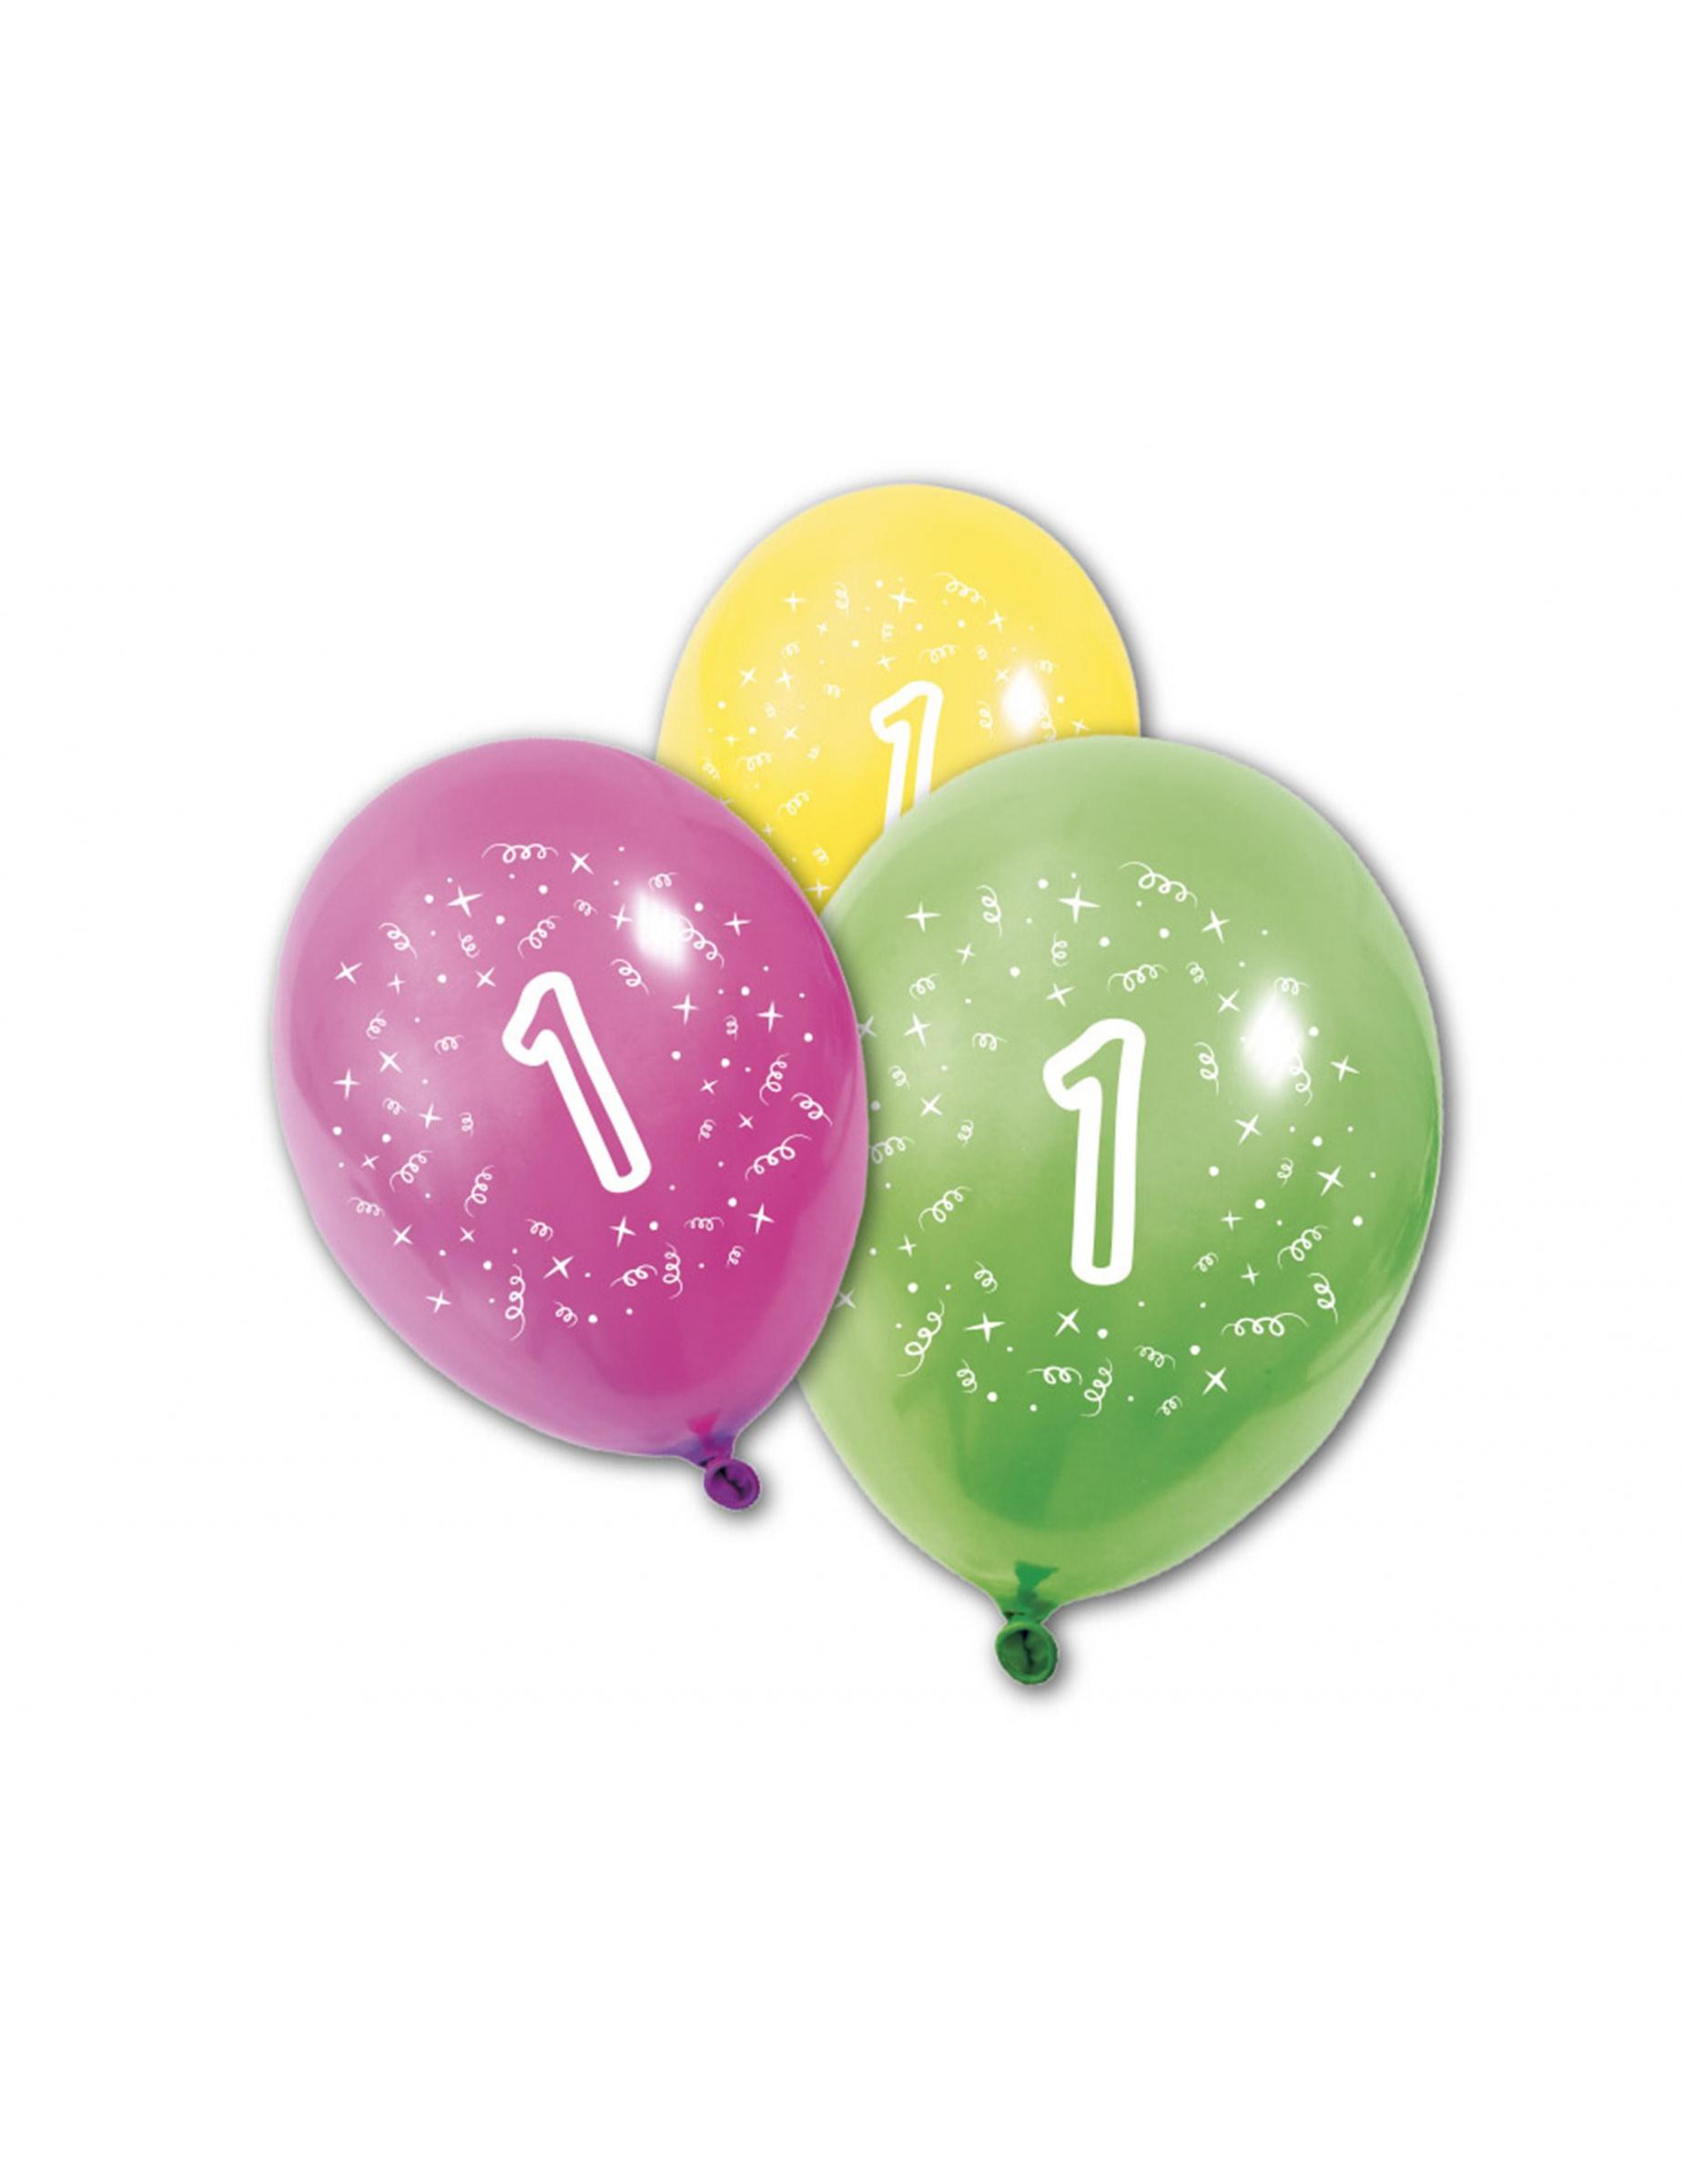 8 globos cumplea os 1 a o decoraci n y disfraces - Decoracion cumpleanos 1 ano ...